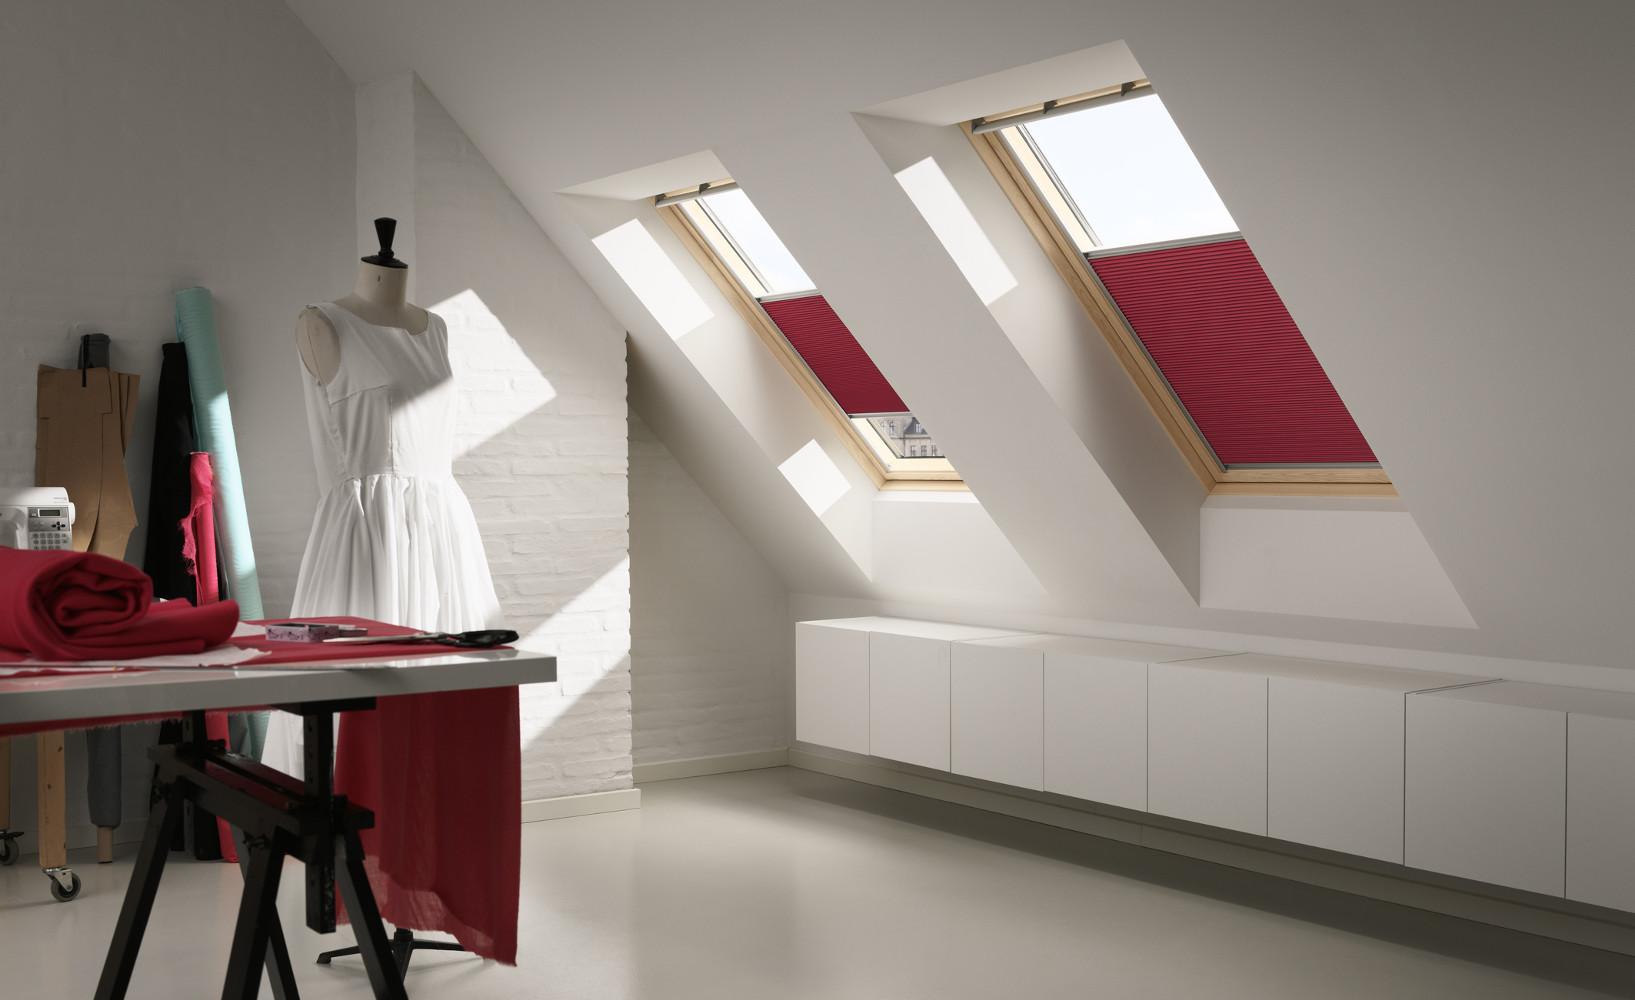 Dachfenster dekorieren best gardinen fr images - Dachfenster dekorieren ...